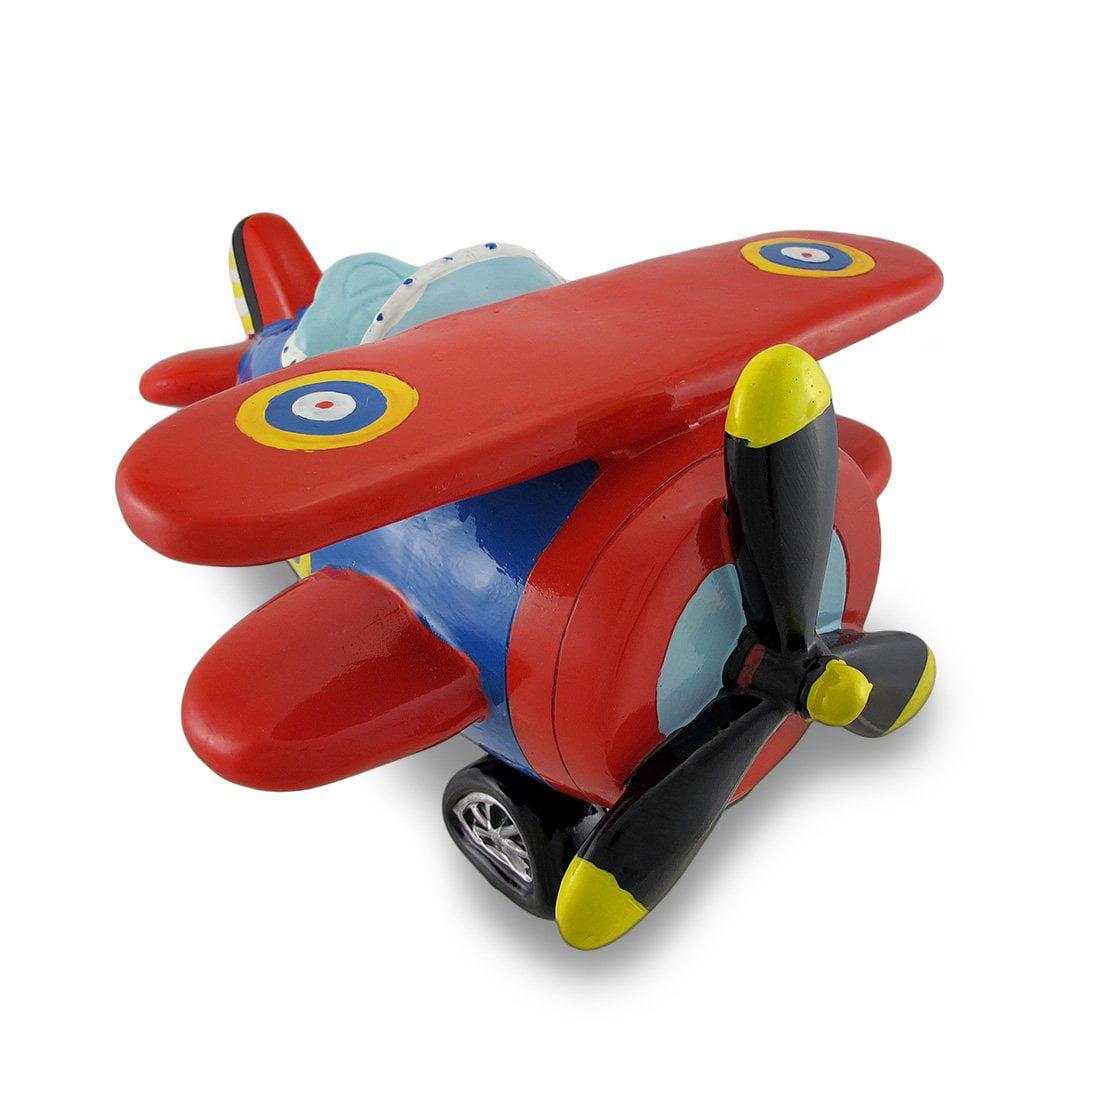 Kingmax Jumbo Red Biplane Piggy Coin Bank